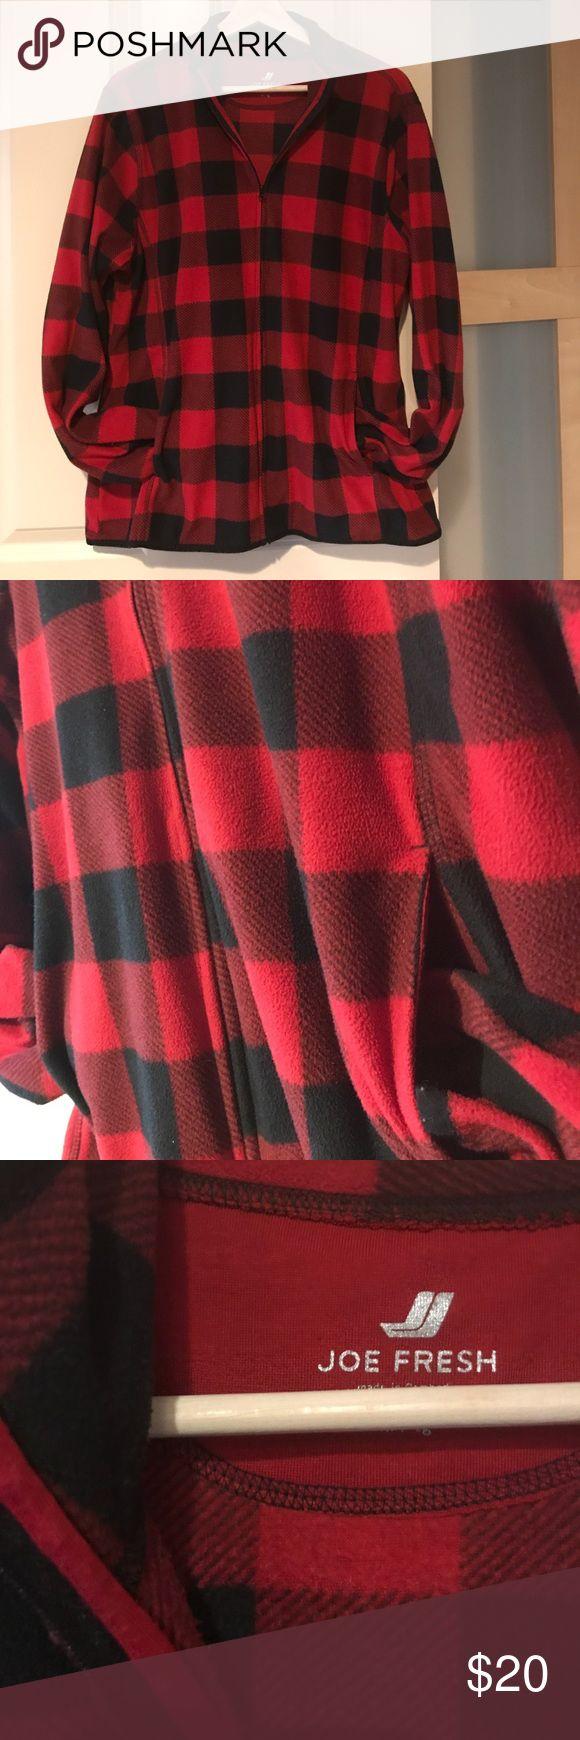 Joe Fresh buffalo plaid fleece zip jacket Perfect for summer camping and fall bonfires! Classic red and black buffalo plaid in warm fleece. Zips all the way up front with pockets. Lighter weight polar fleece is great for layering. Joe Fresh size XL Joe Fresh Jackets & Coats